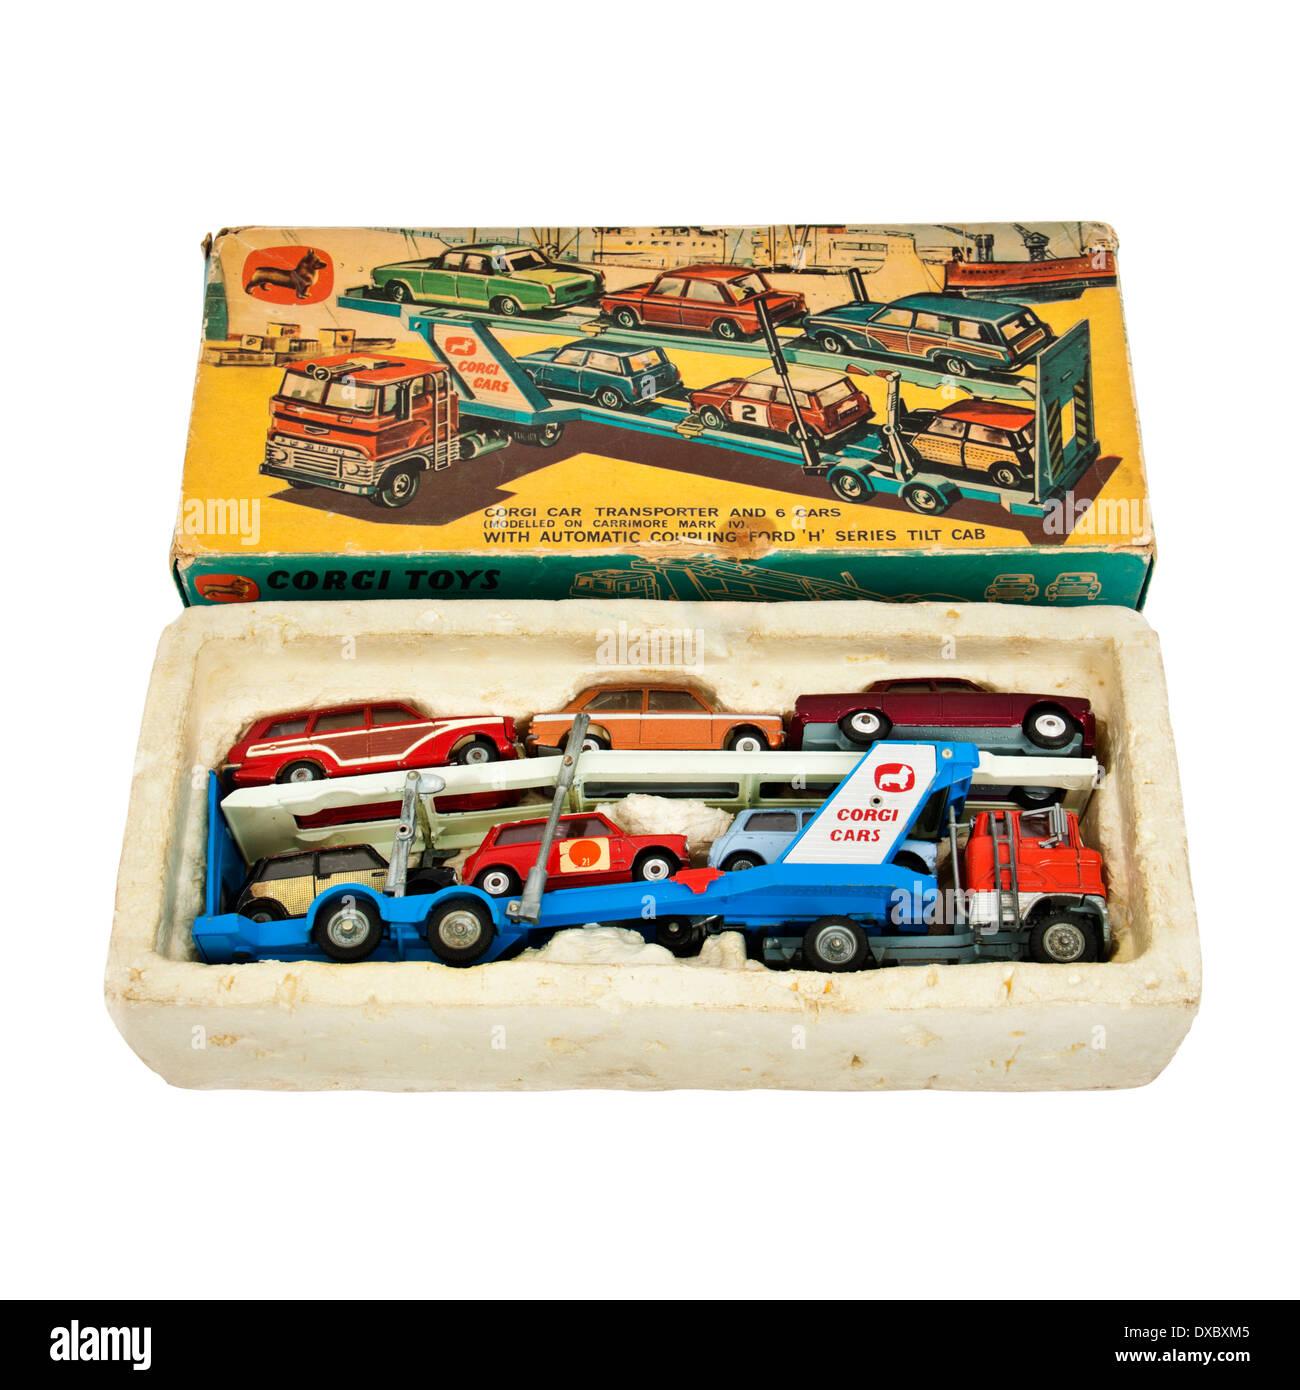 Rare vintage Corgy Toys No 41 cadeau de 1967, contenant des Carrimore Mark IV-autos Photo Stock